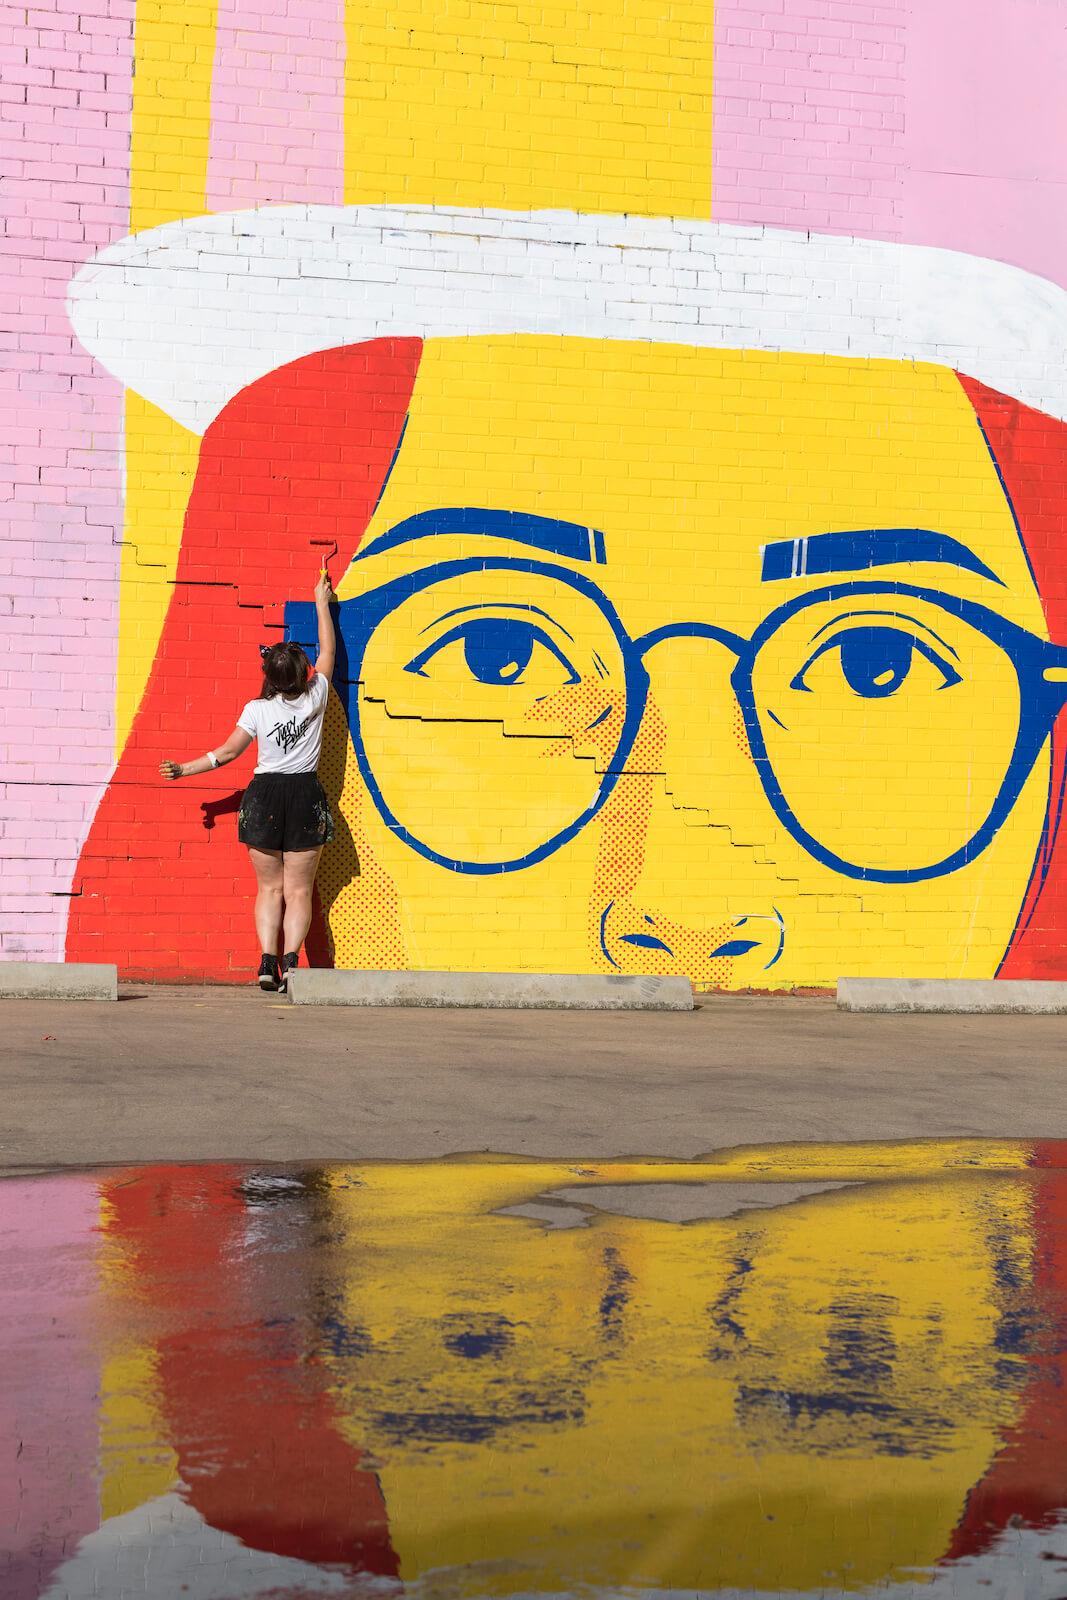 Wall to Wall Street Art Festival, Benalla, Australia 2018